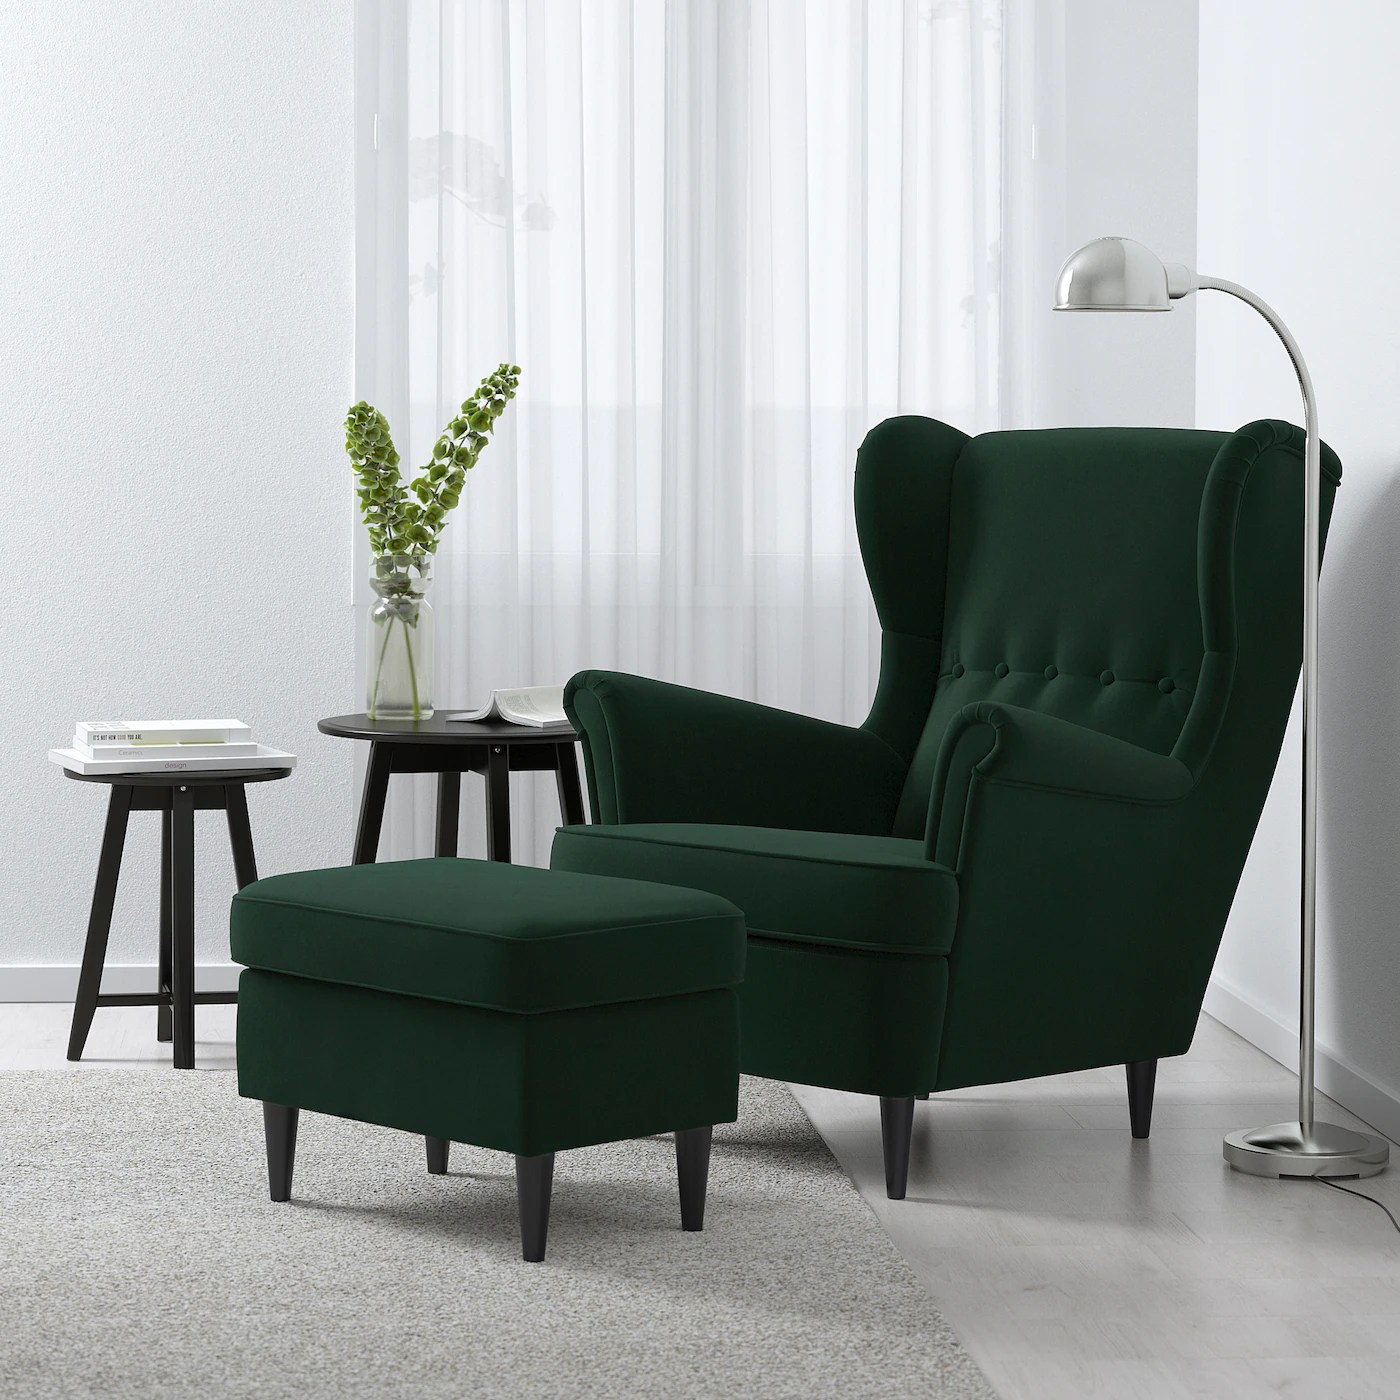 strandmon fauteuil a oreilles djuparp vert fonce